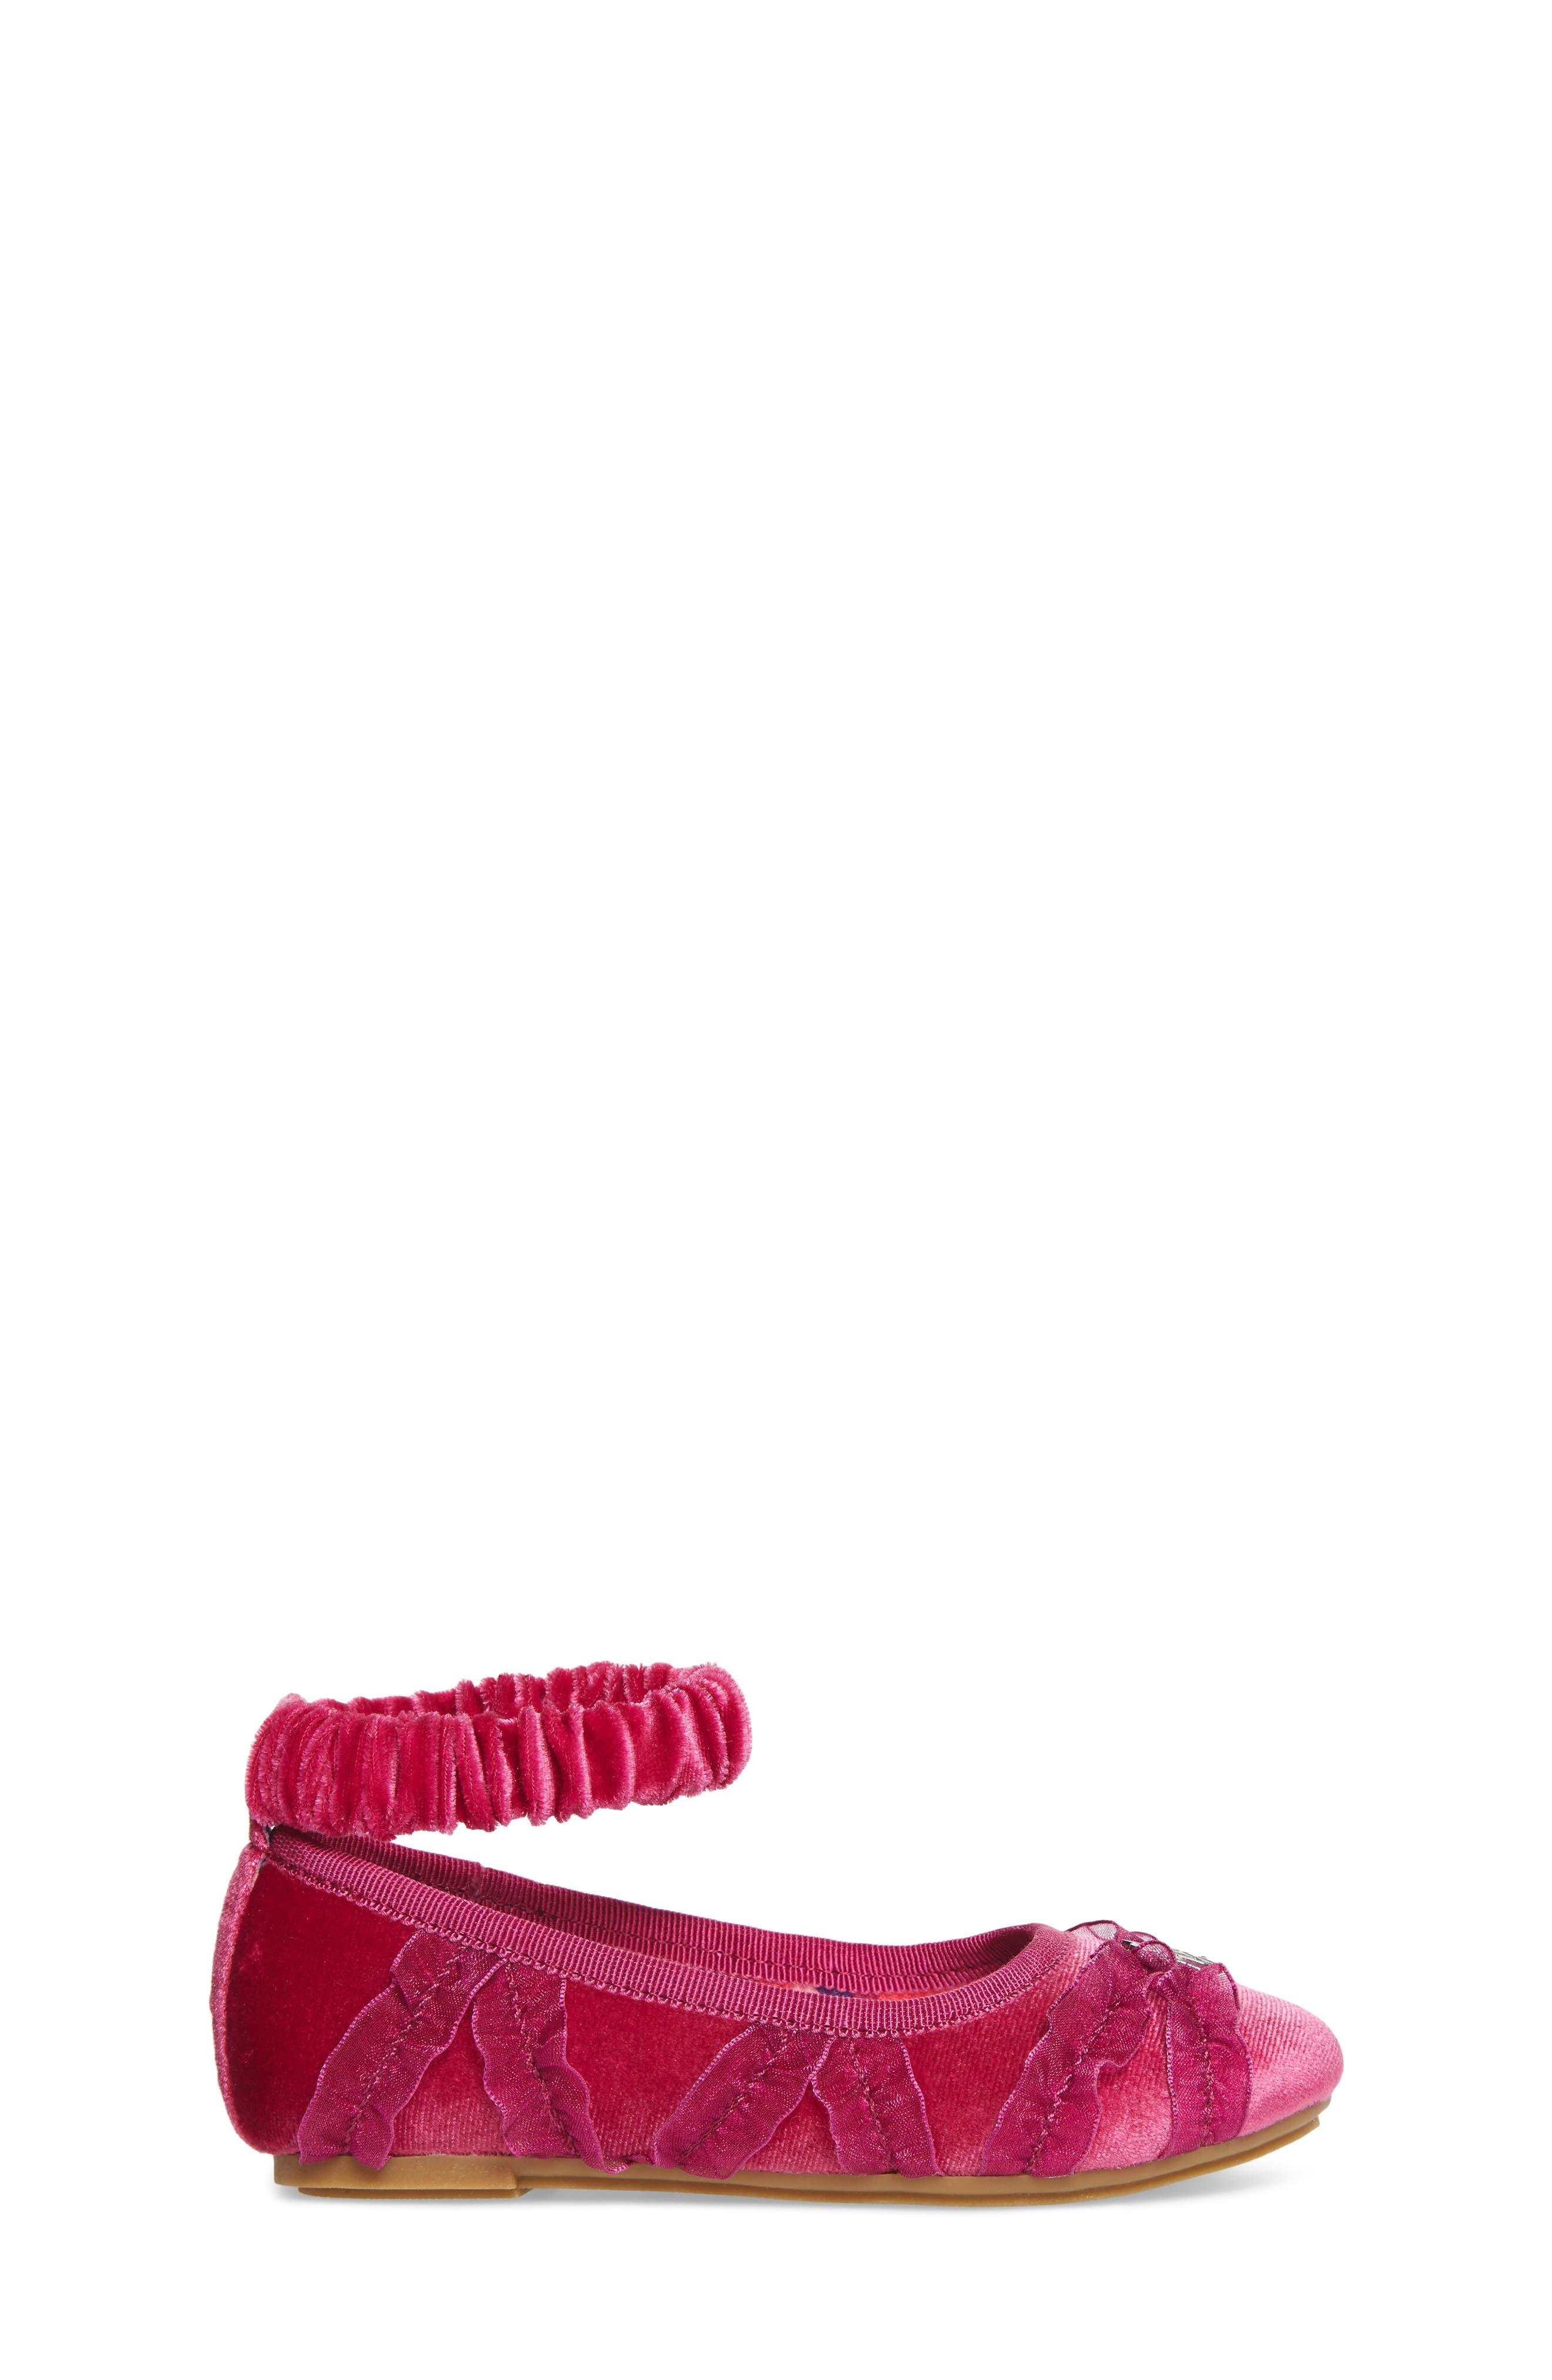 Emerson Ankle Strap Ballet Flat,                             Alternate thumbnail 3, color,                             650